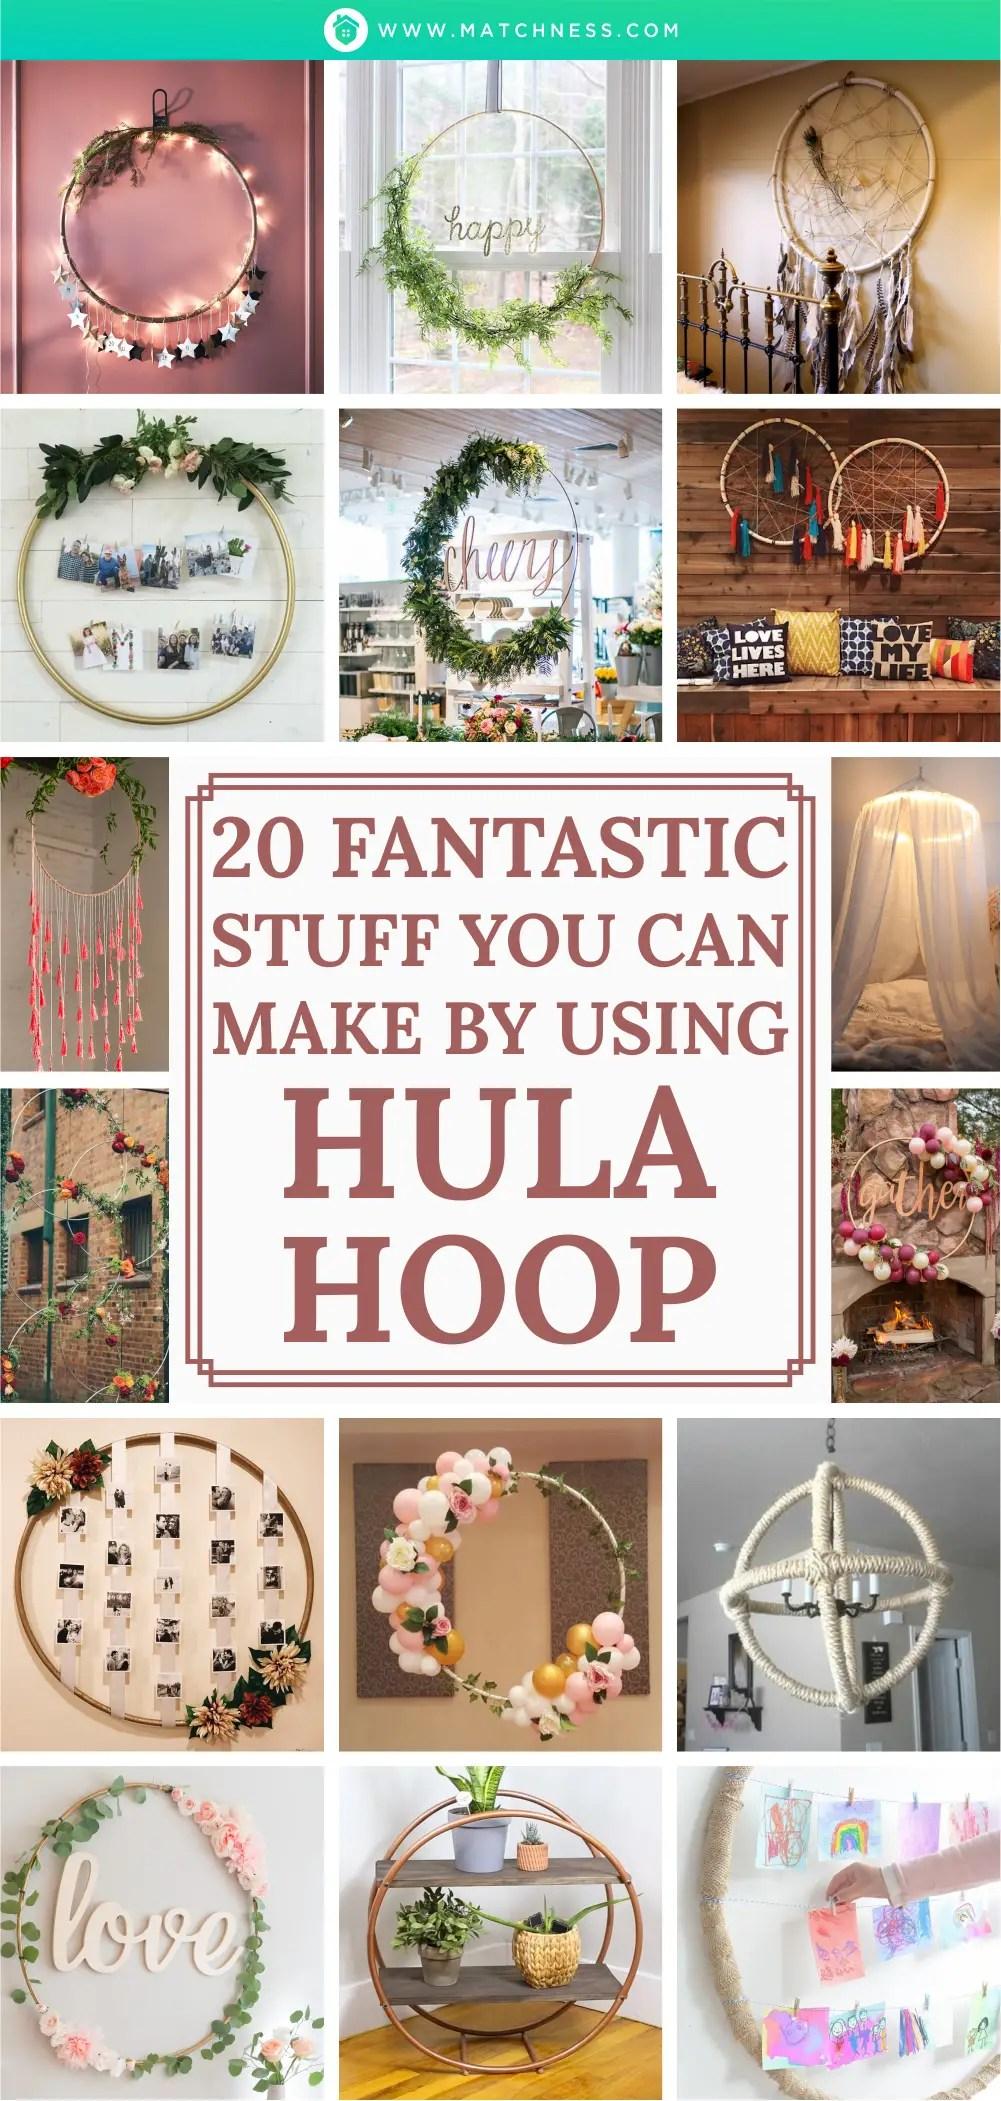 20-fantastic-stuff-you-can-make-by-using-hula-hoop